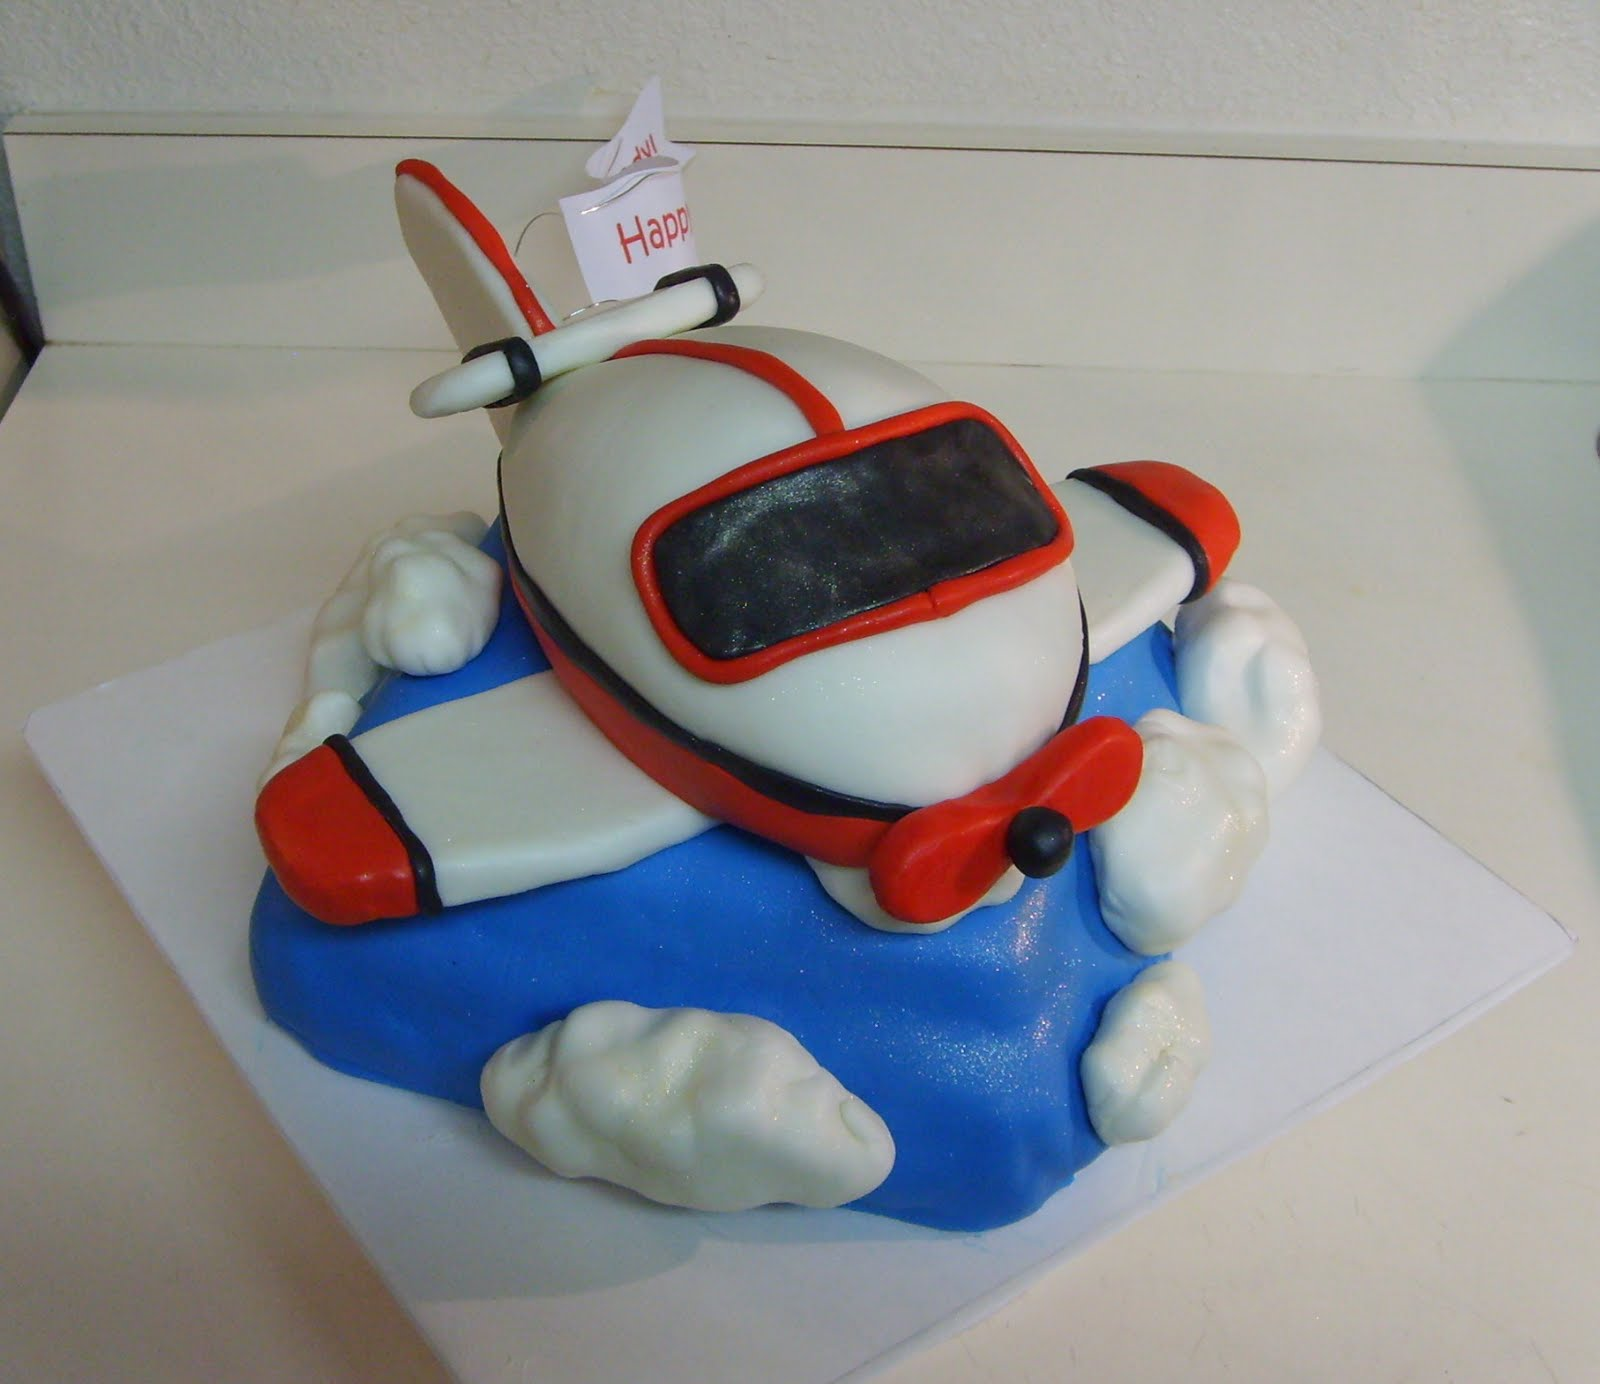 How To Make An Airplane Birthday Cake